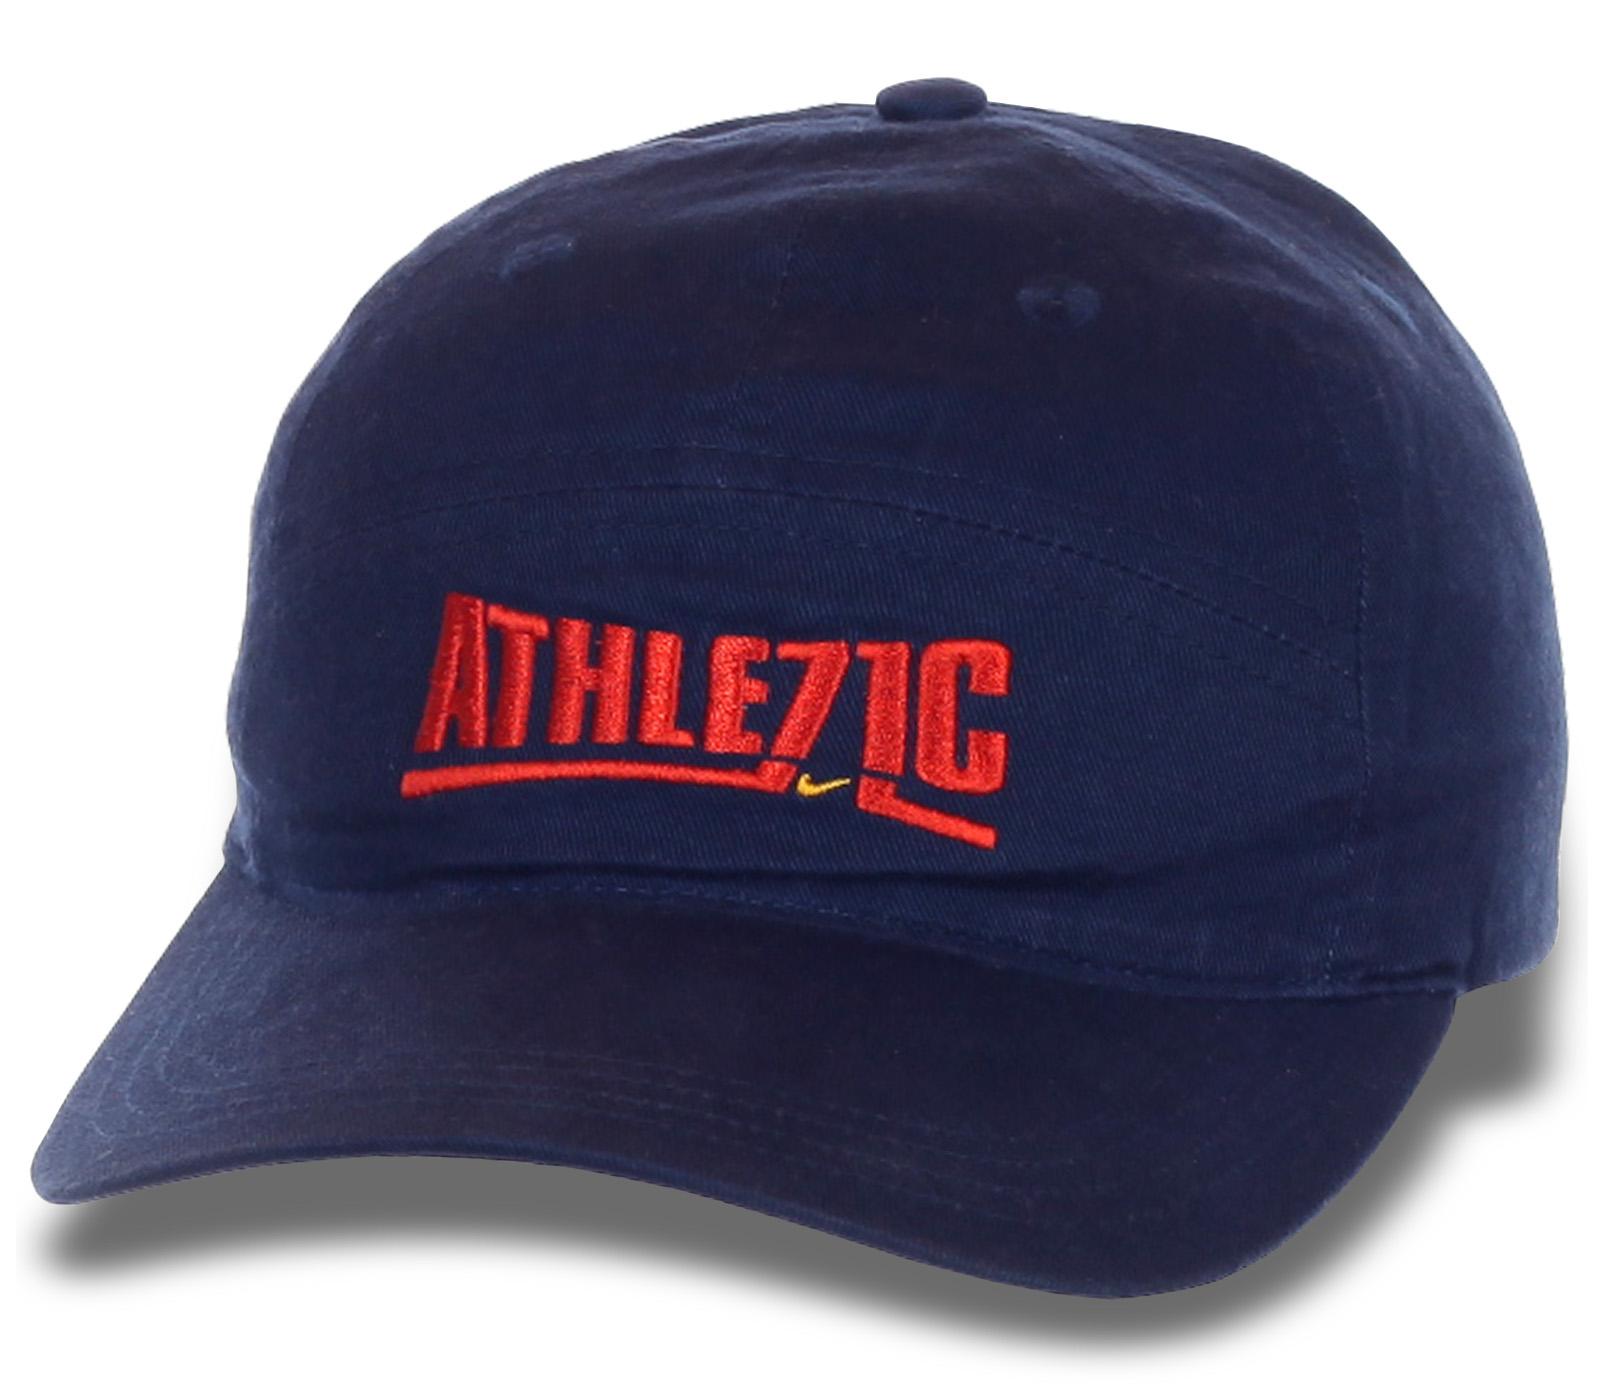 Бейсболка ATHLE71C